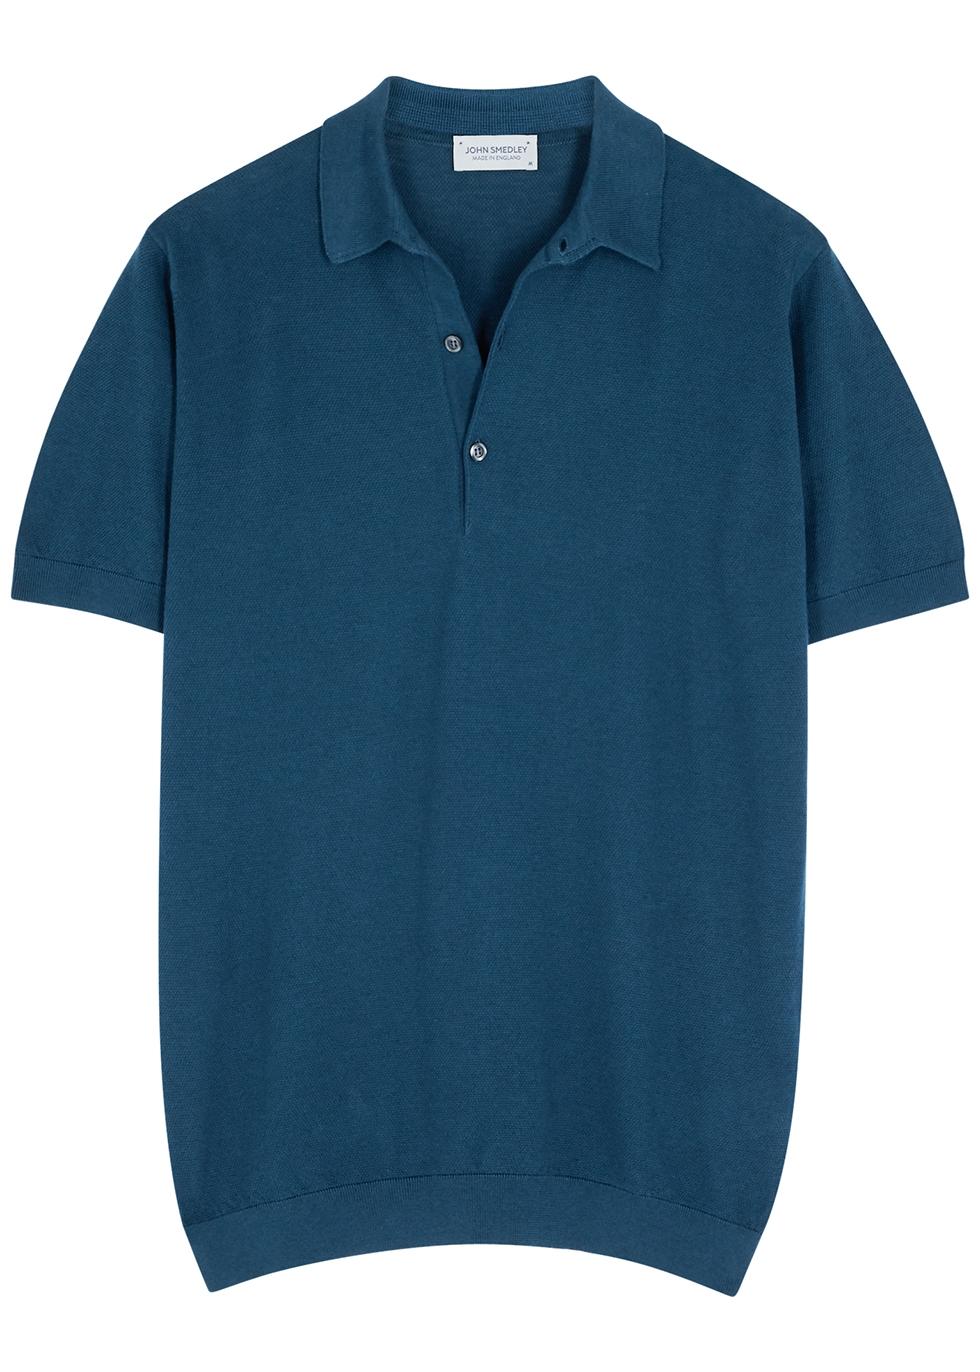 Roth dark blue textured-knit polo shirt